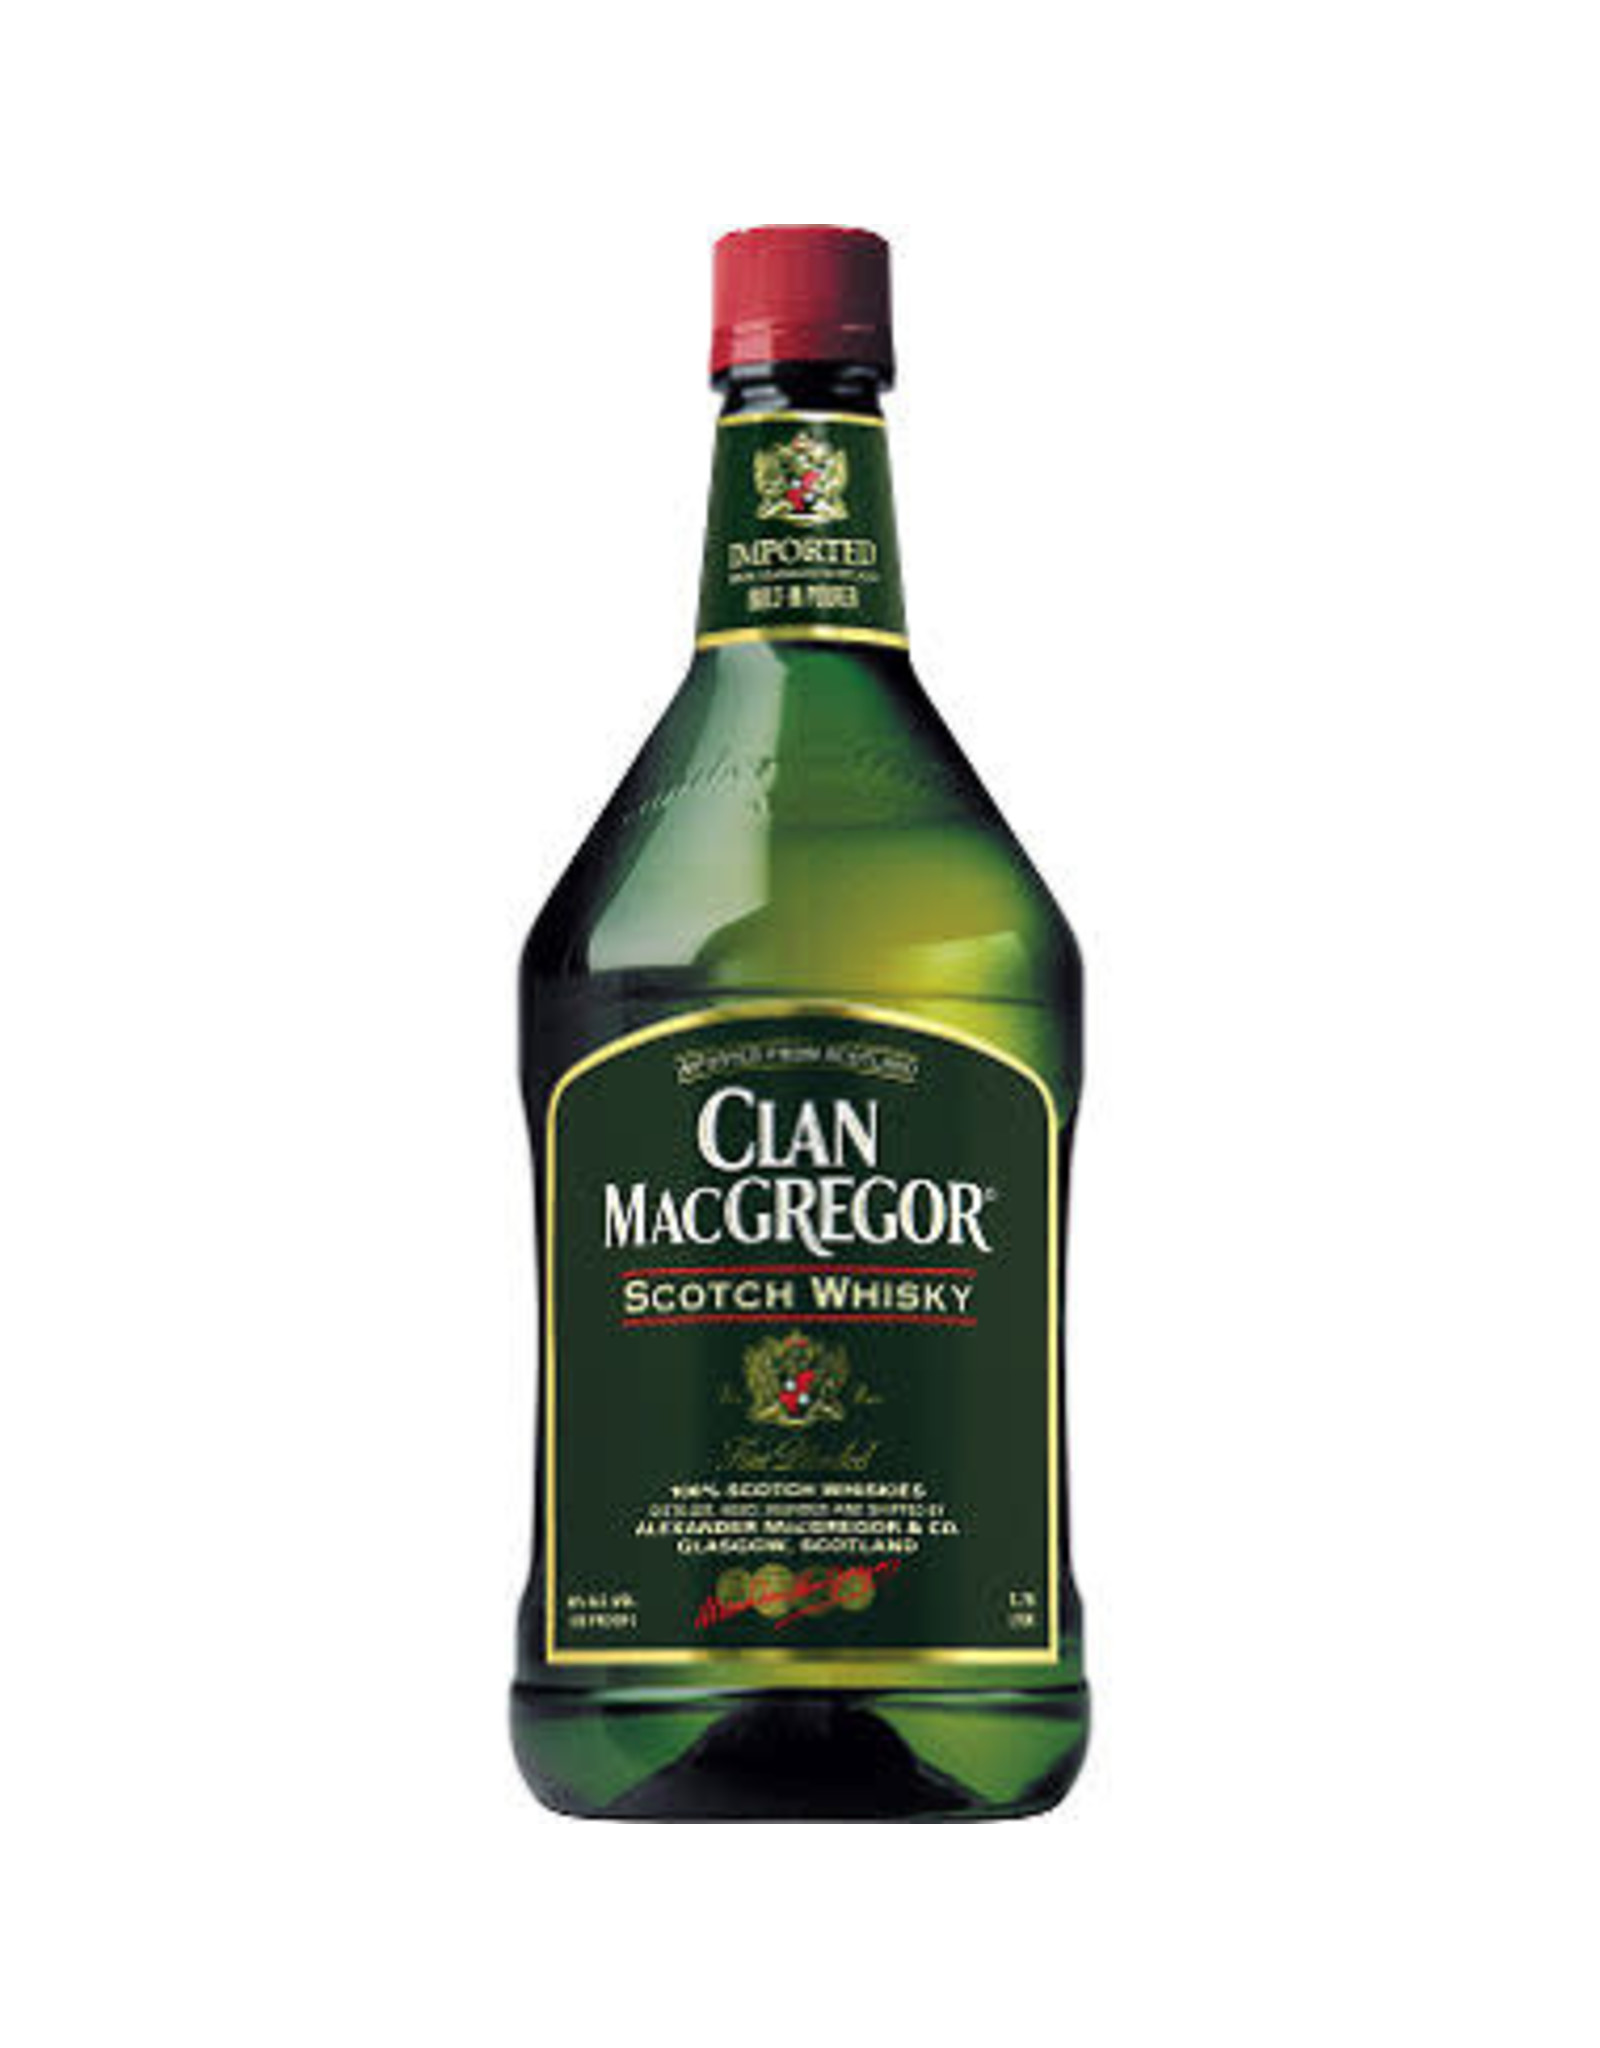 CLAN MACGREGOR SCOTCH 1.75L